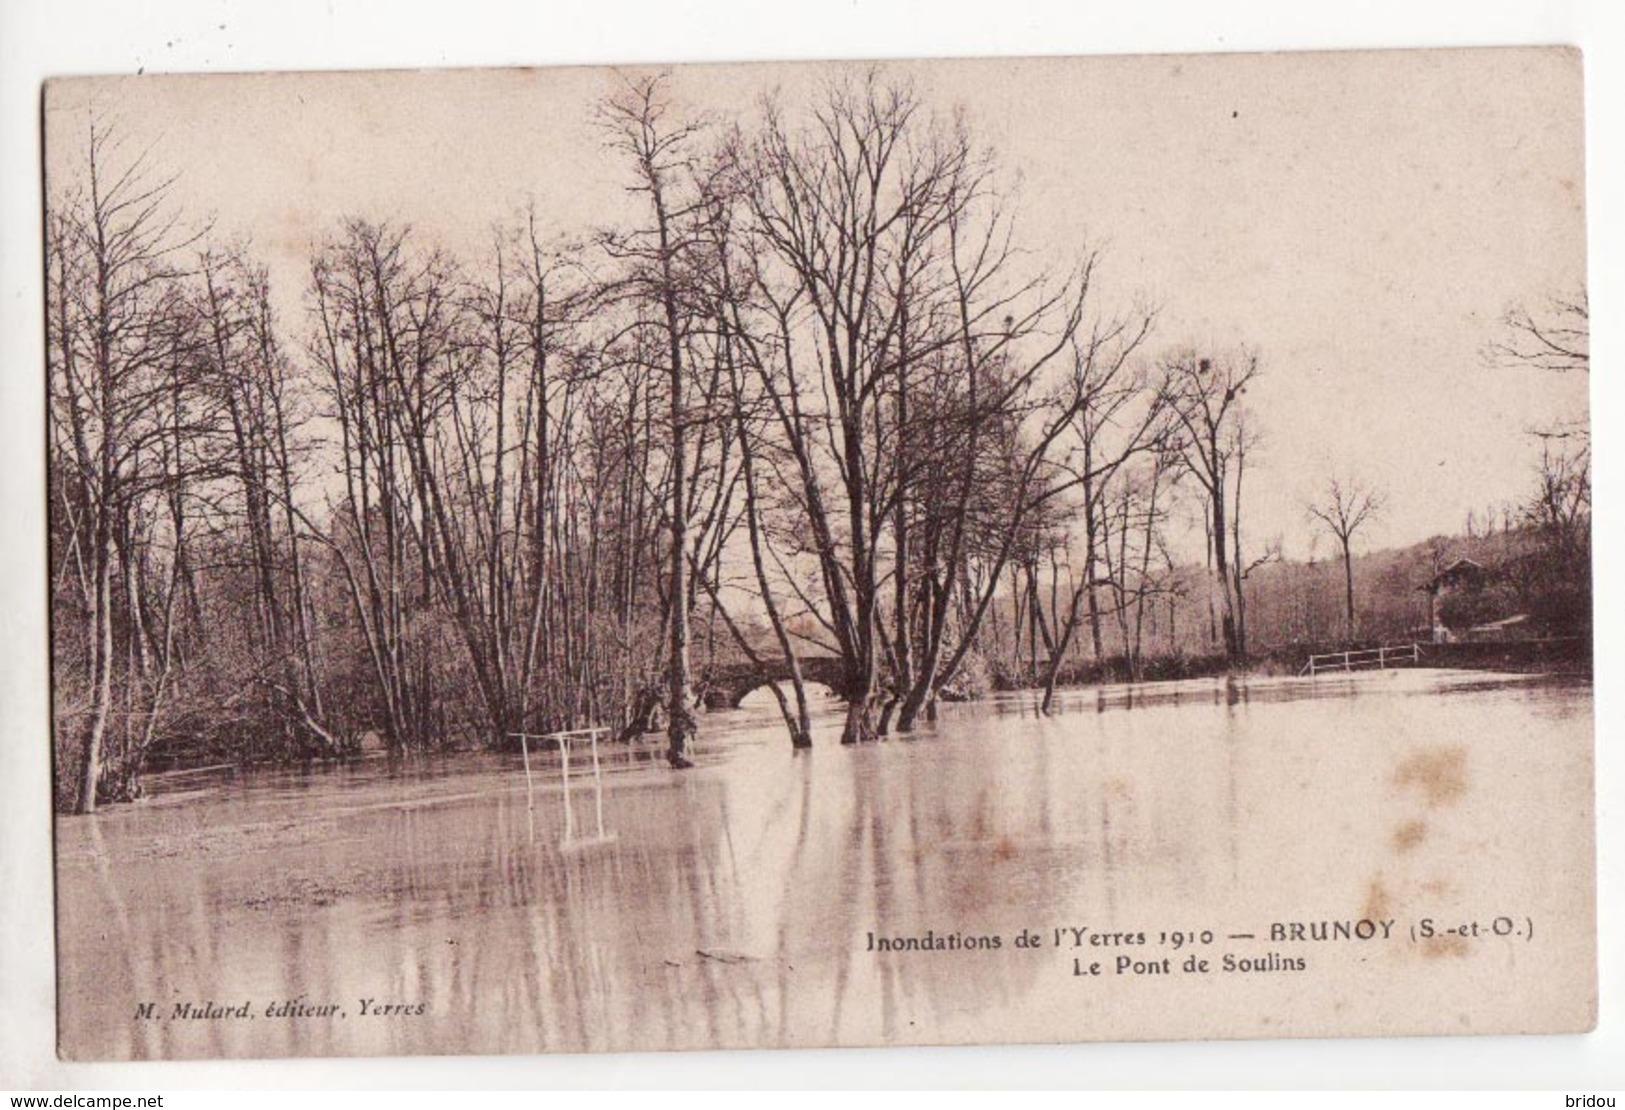 91  BRUNOY   Inondations 1910   Pont De Soulins - Brunoy